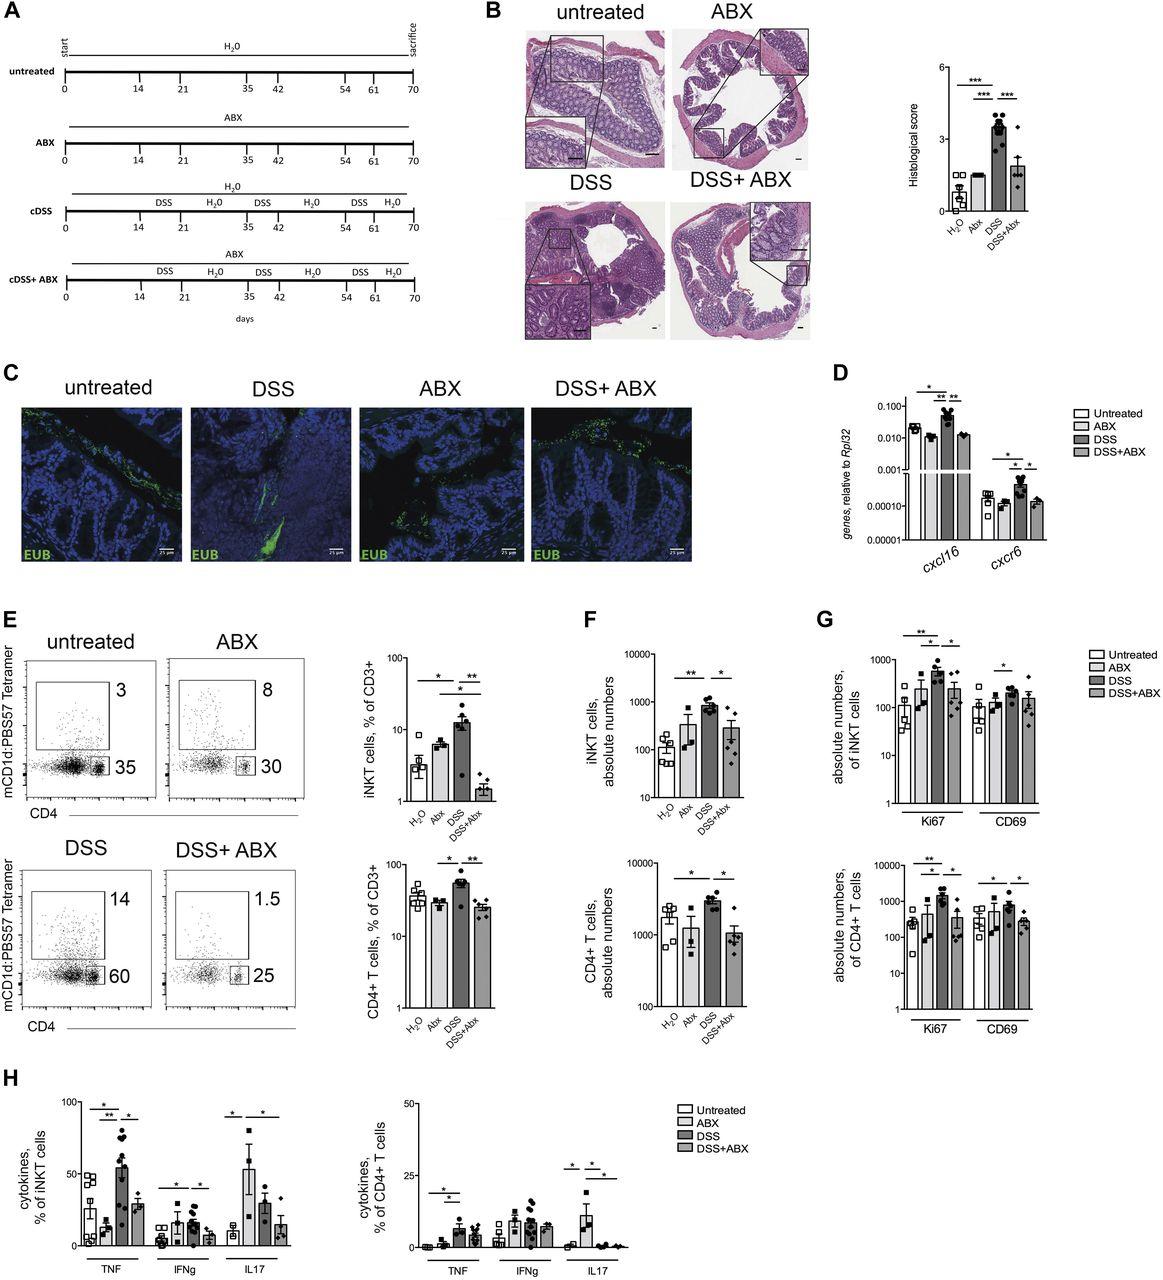 Mucosa-associated microbiota drives pathogenic functions in IBD